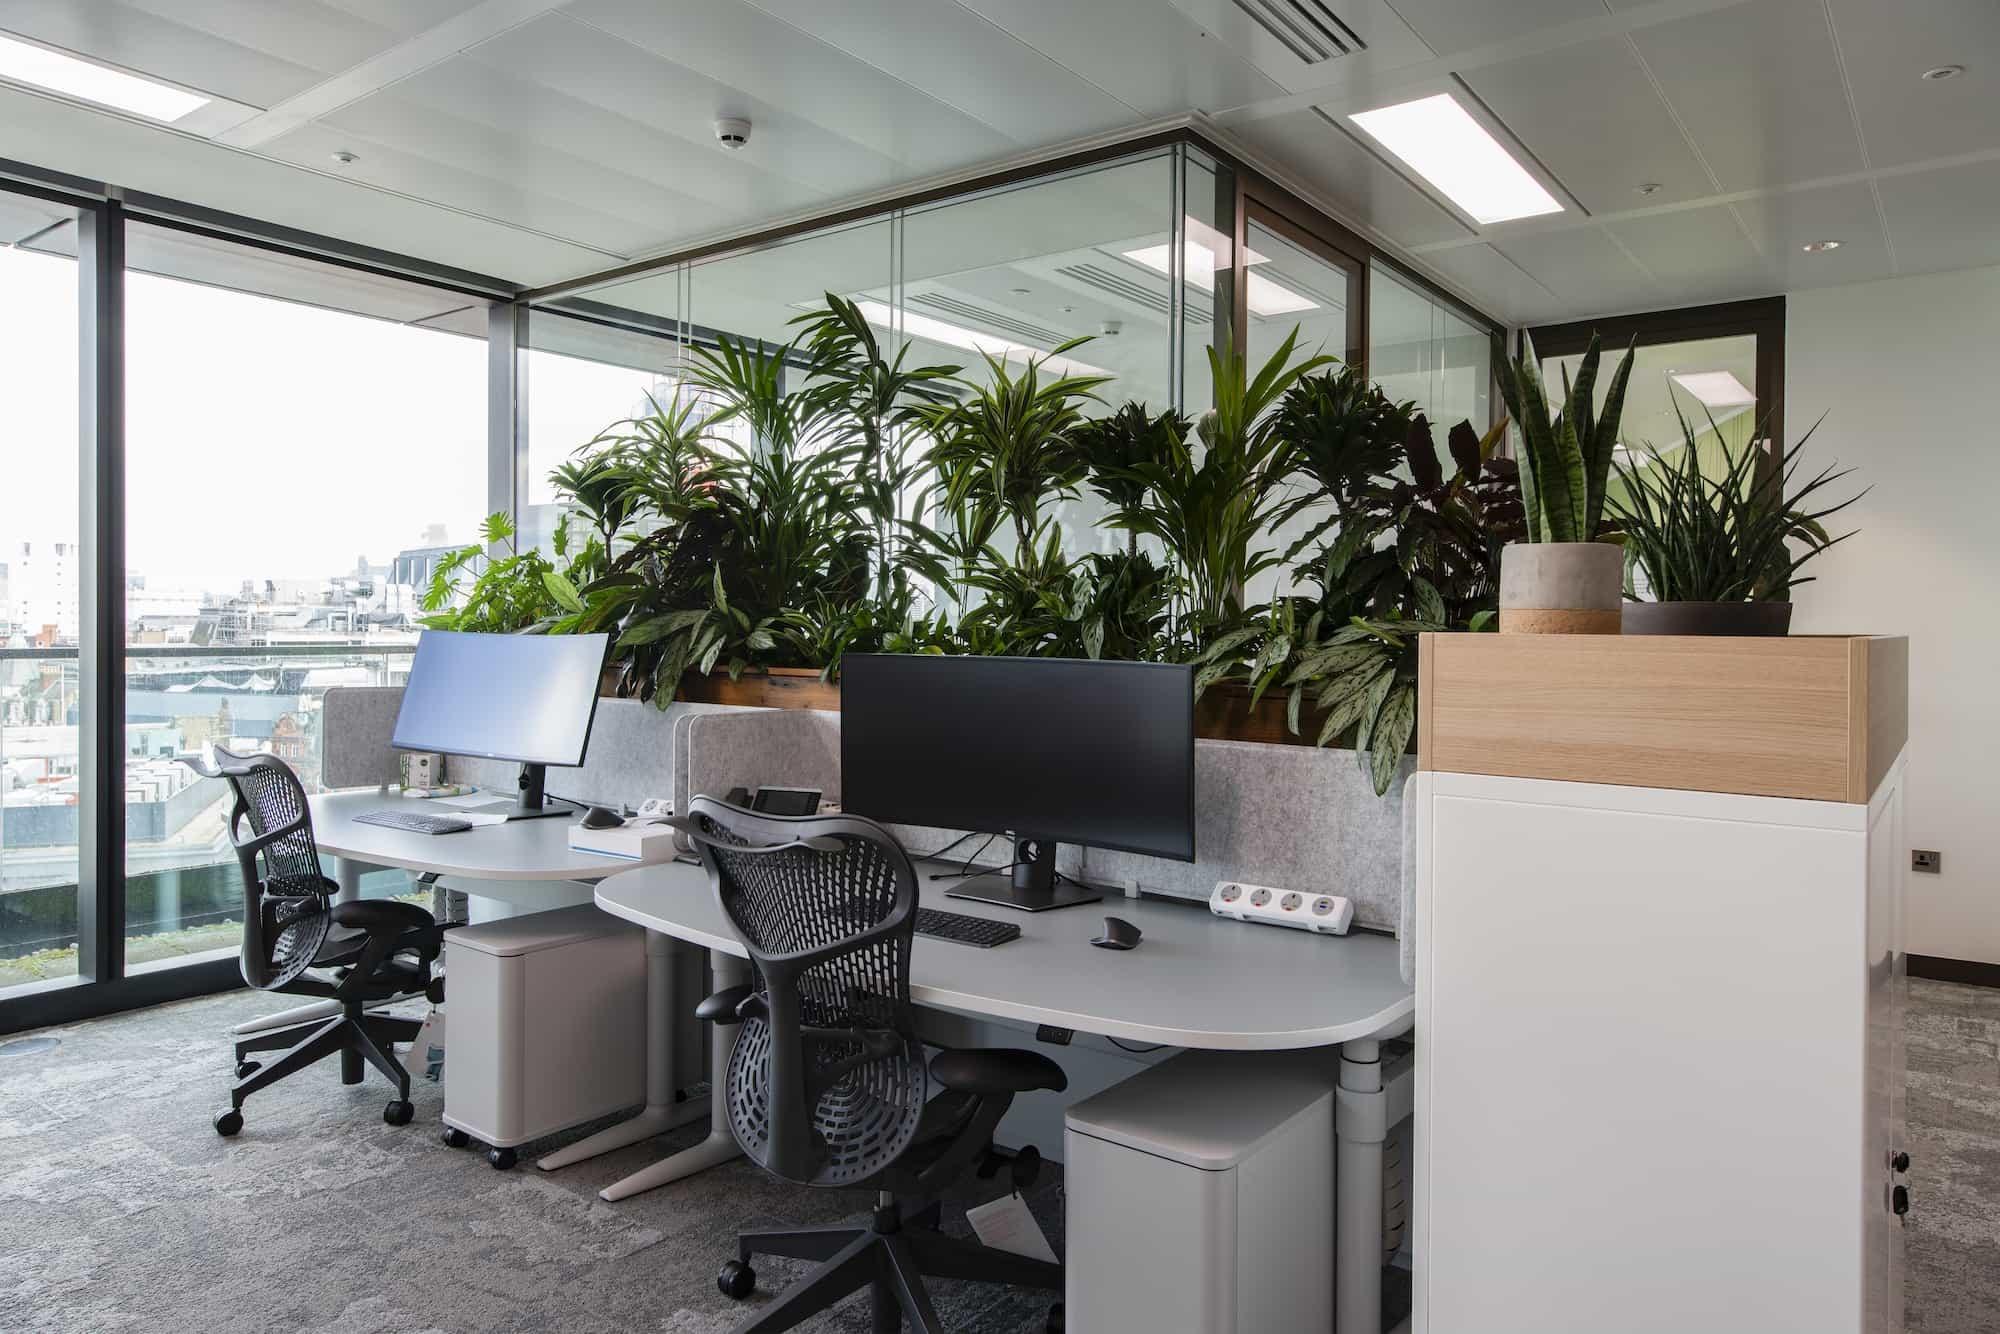 Generation IM desks and biophilic office design